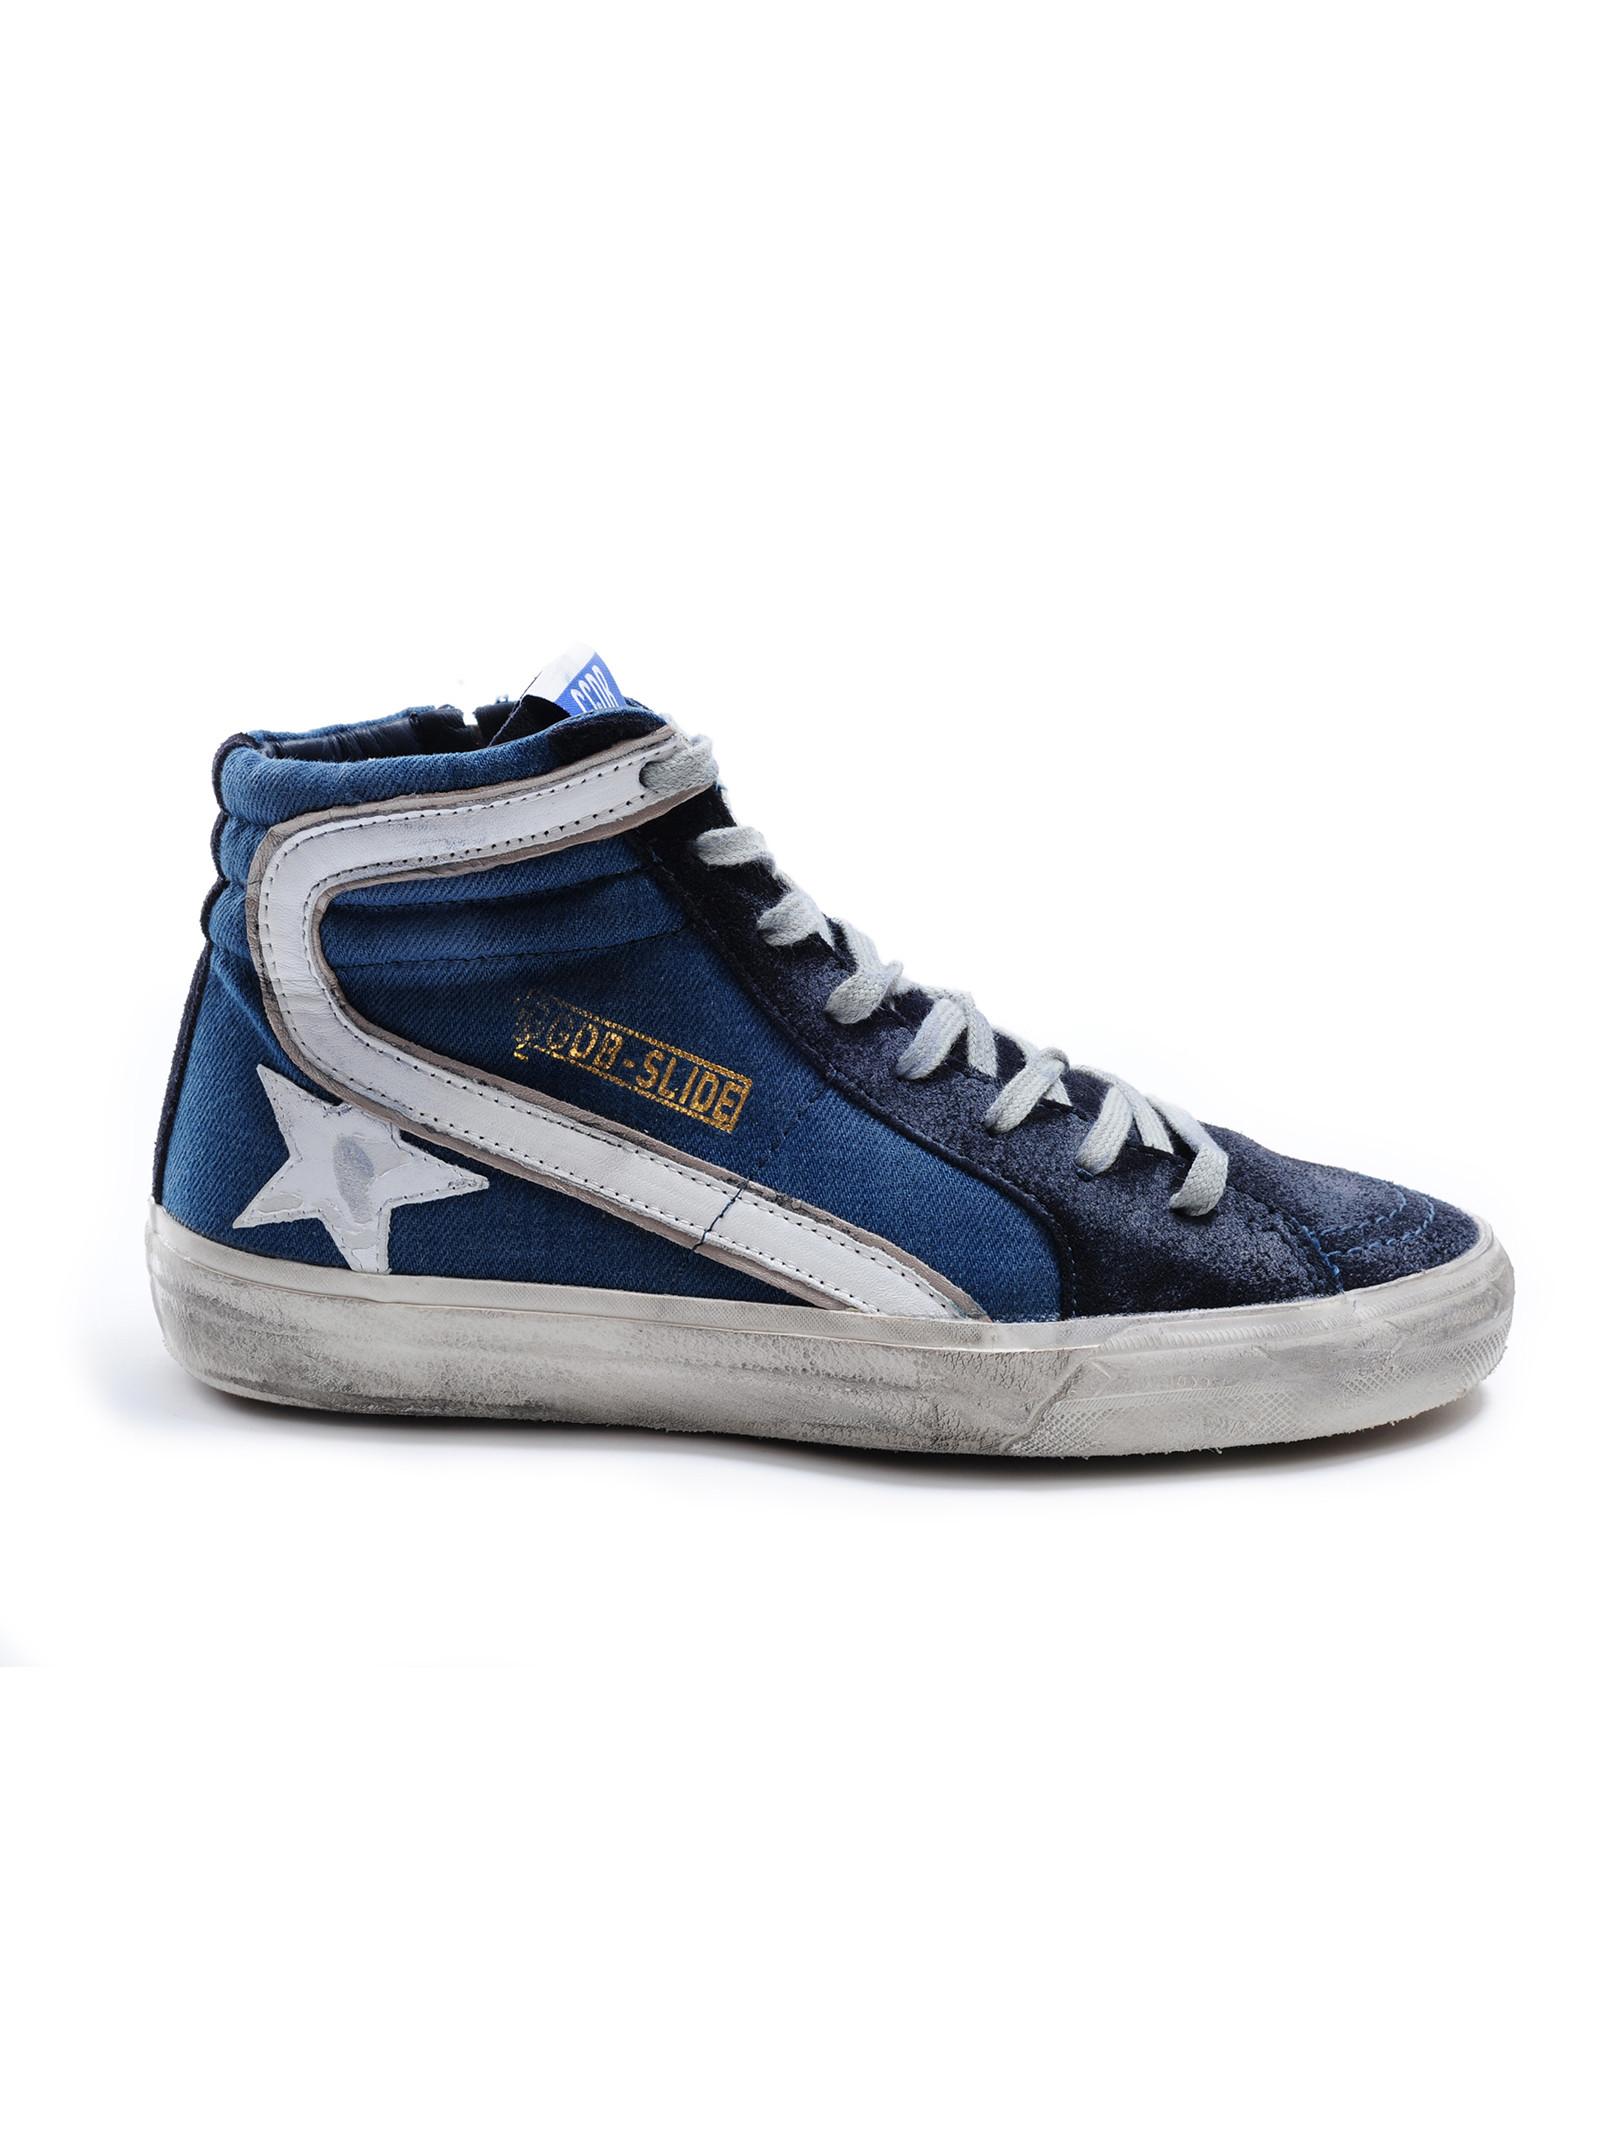 golden goose sneakers slide g25u595 a2 men 39 s sneakers italist. Black Bedroom Furniture Sets. Home Design Ideas